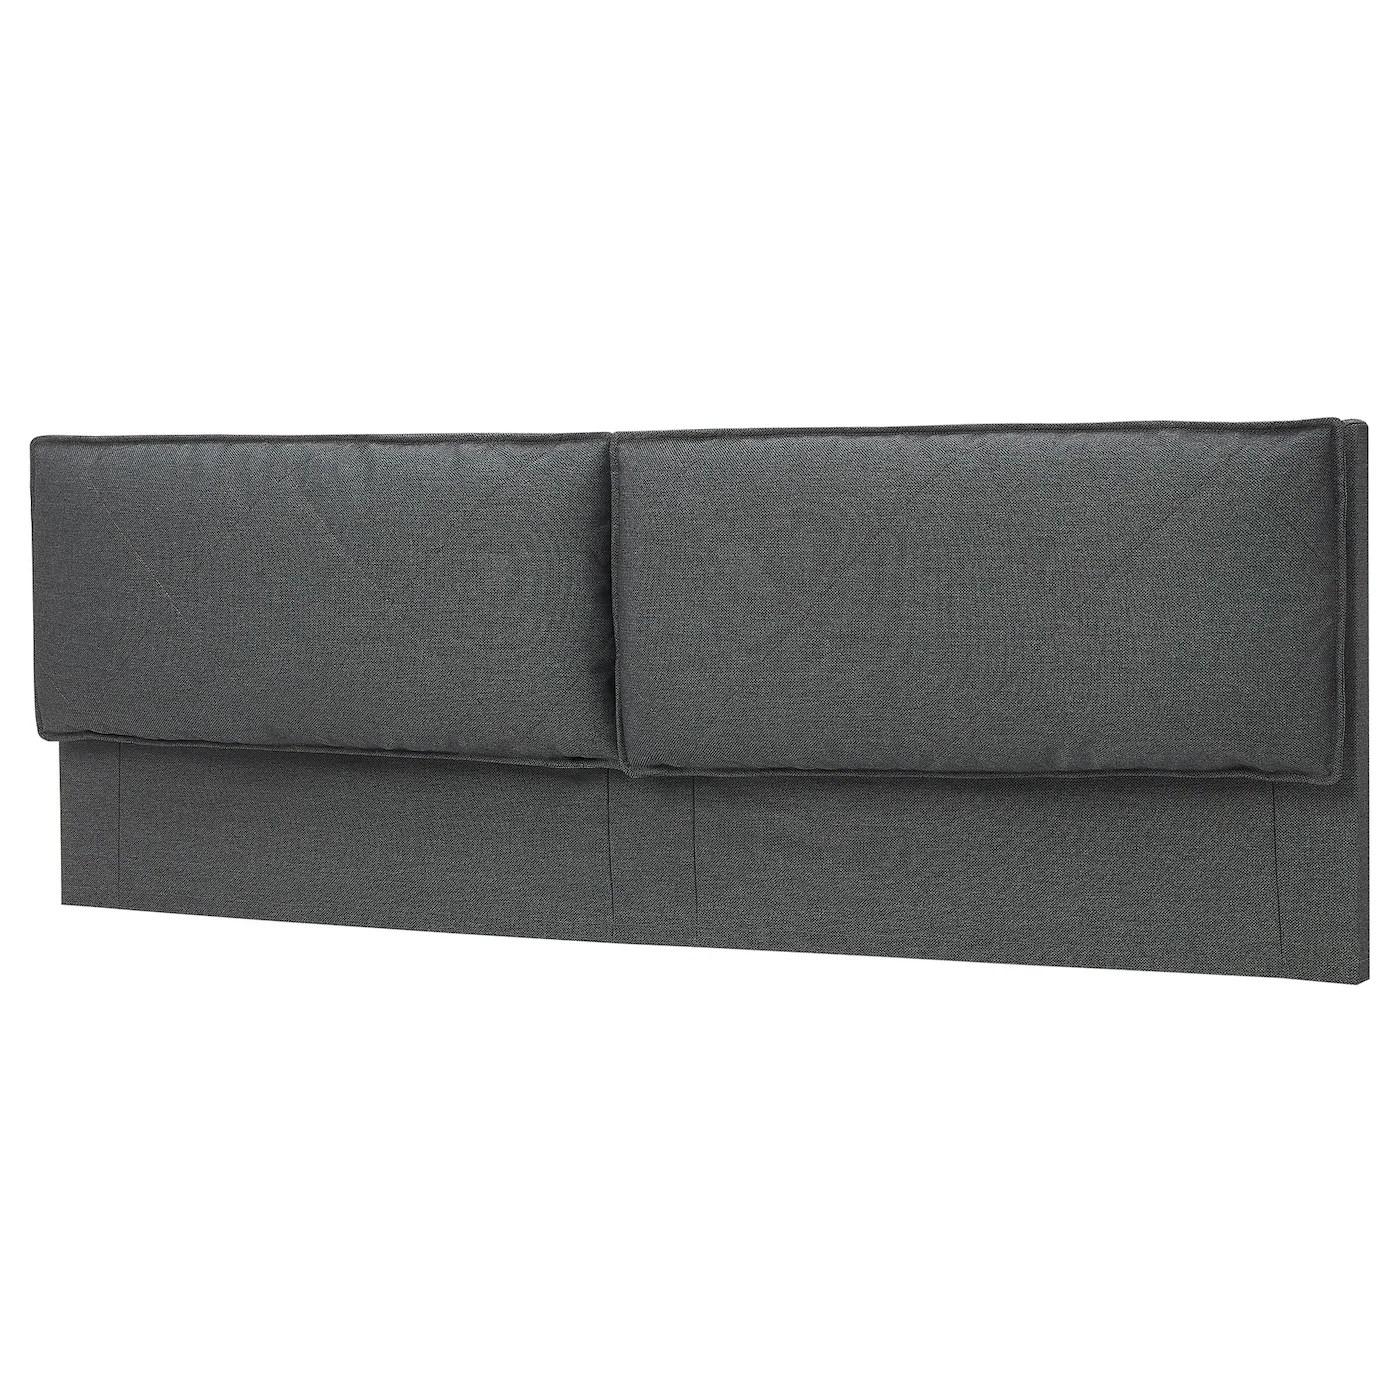 malm headboard cover with 2 pillows idekulla dark grey standard king